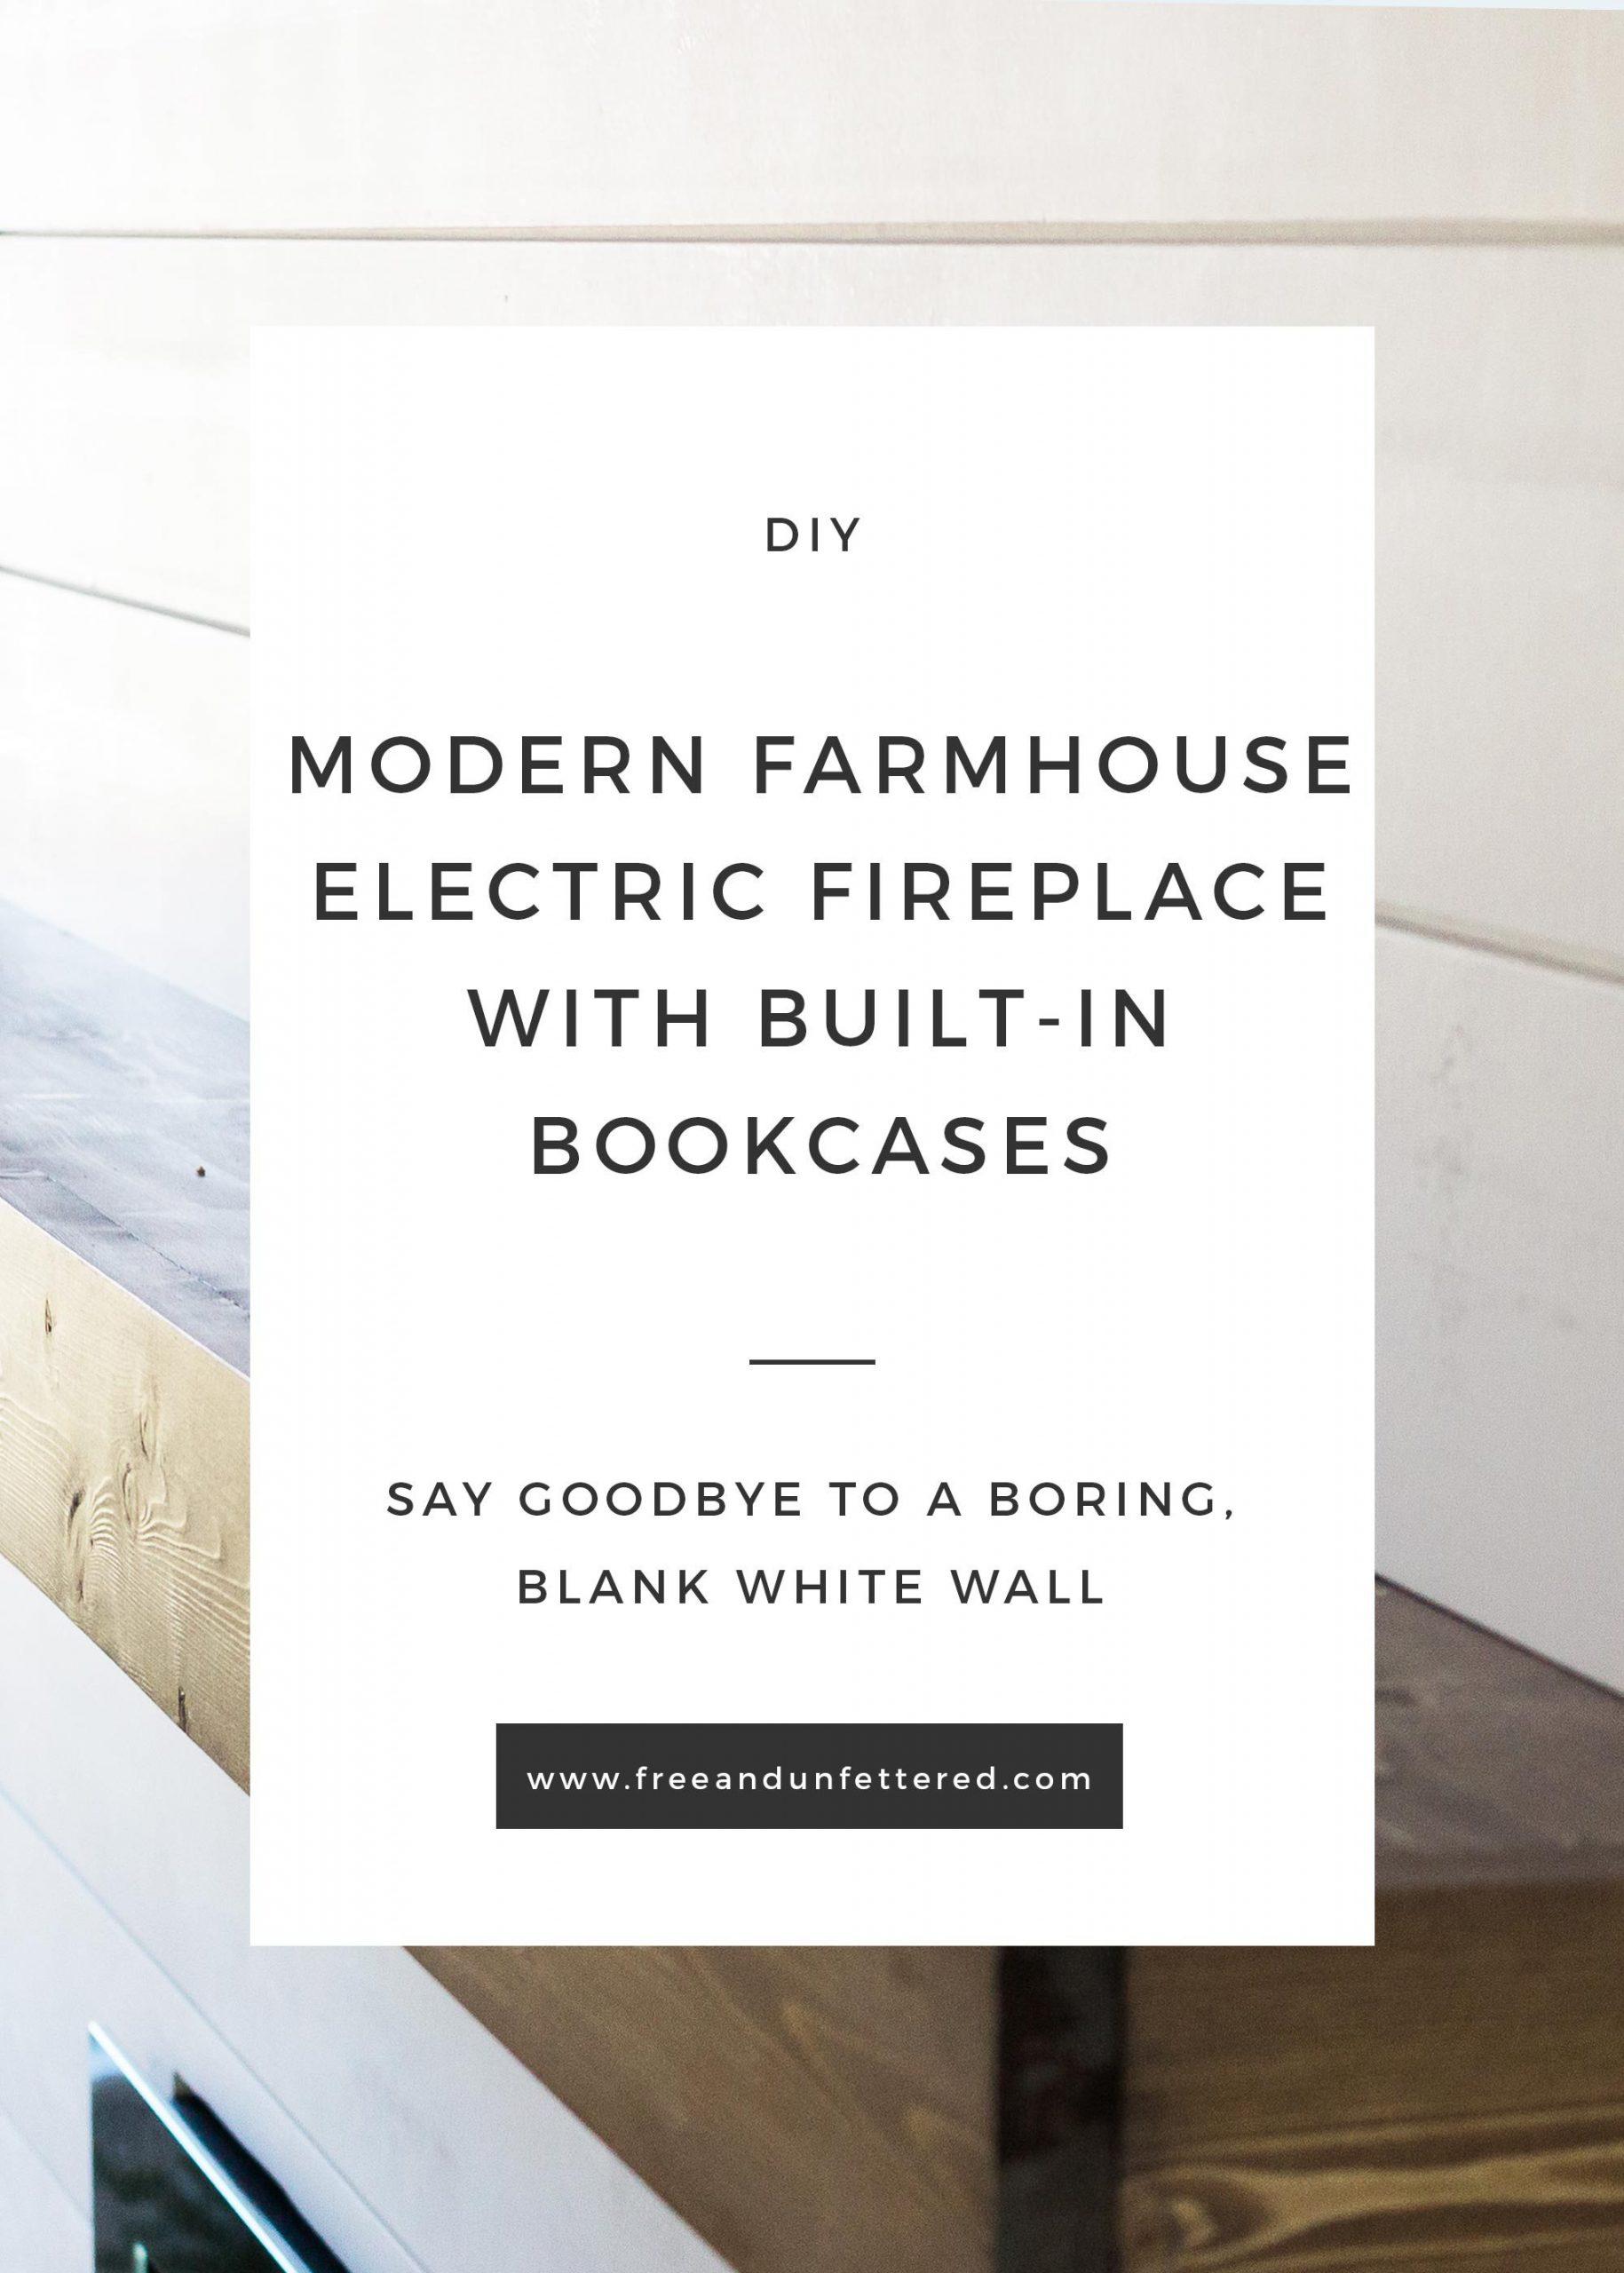 diy modern farmhouse electric fireplace